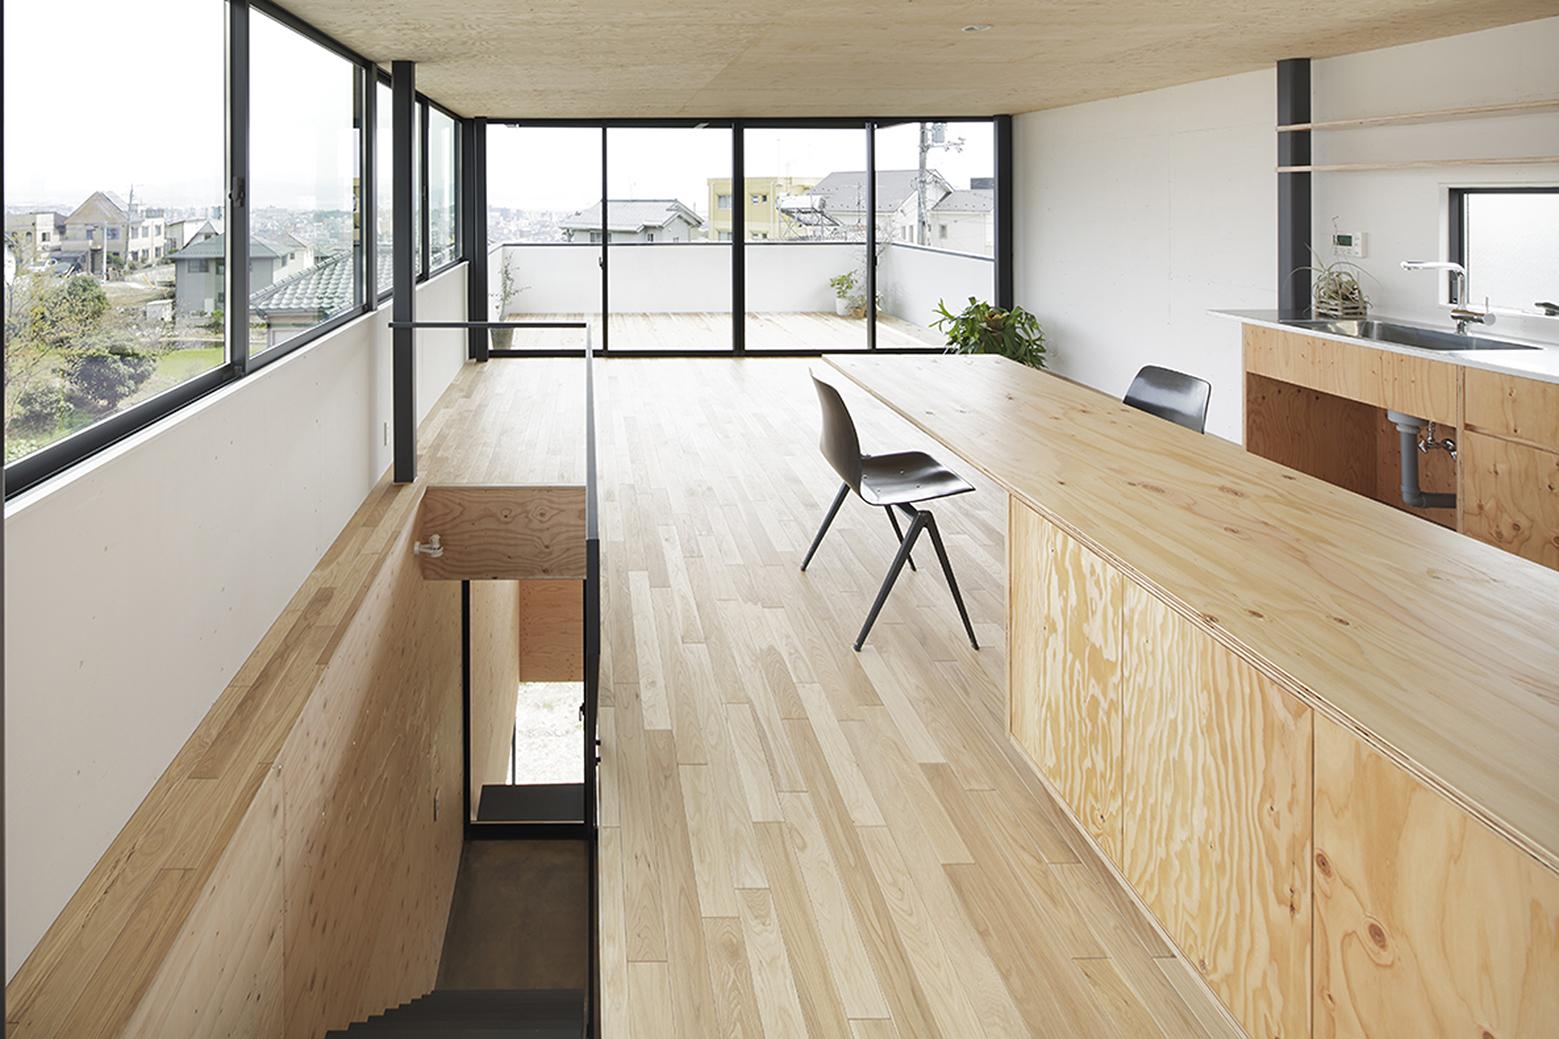 540ea1a4c07a80b906000150_house-in-miyake-hidetaka-nakahara-architects-yoshio-ohno-architects_oono_miyake_140407_040